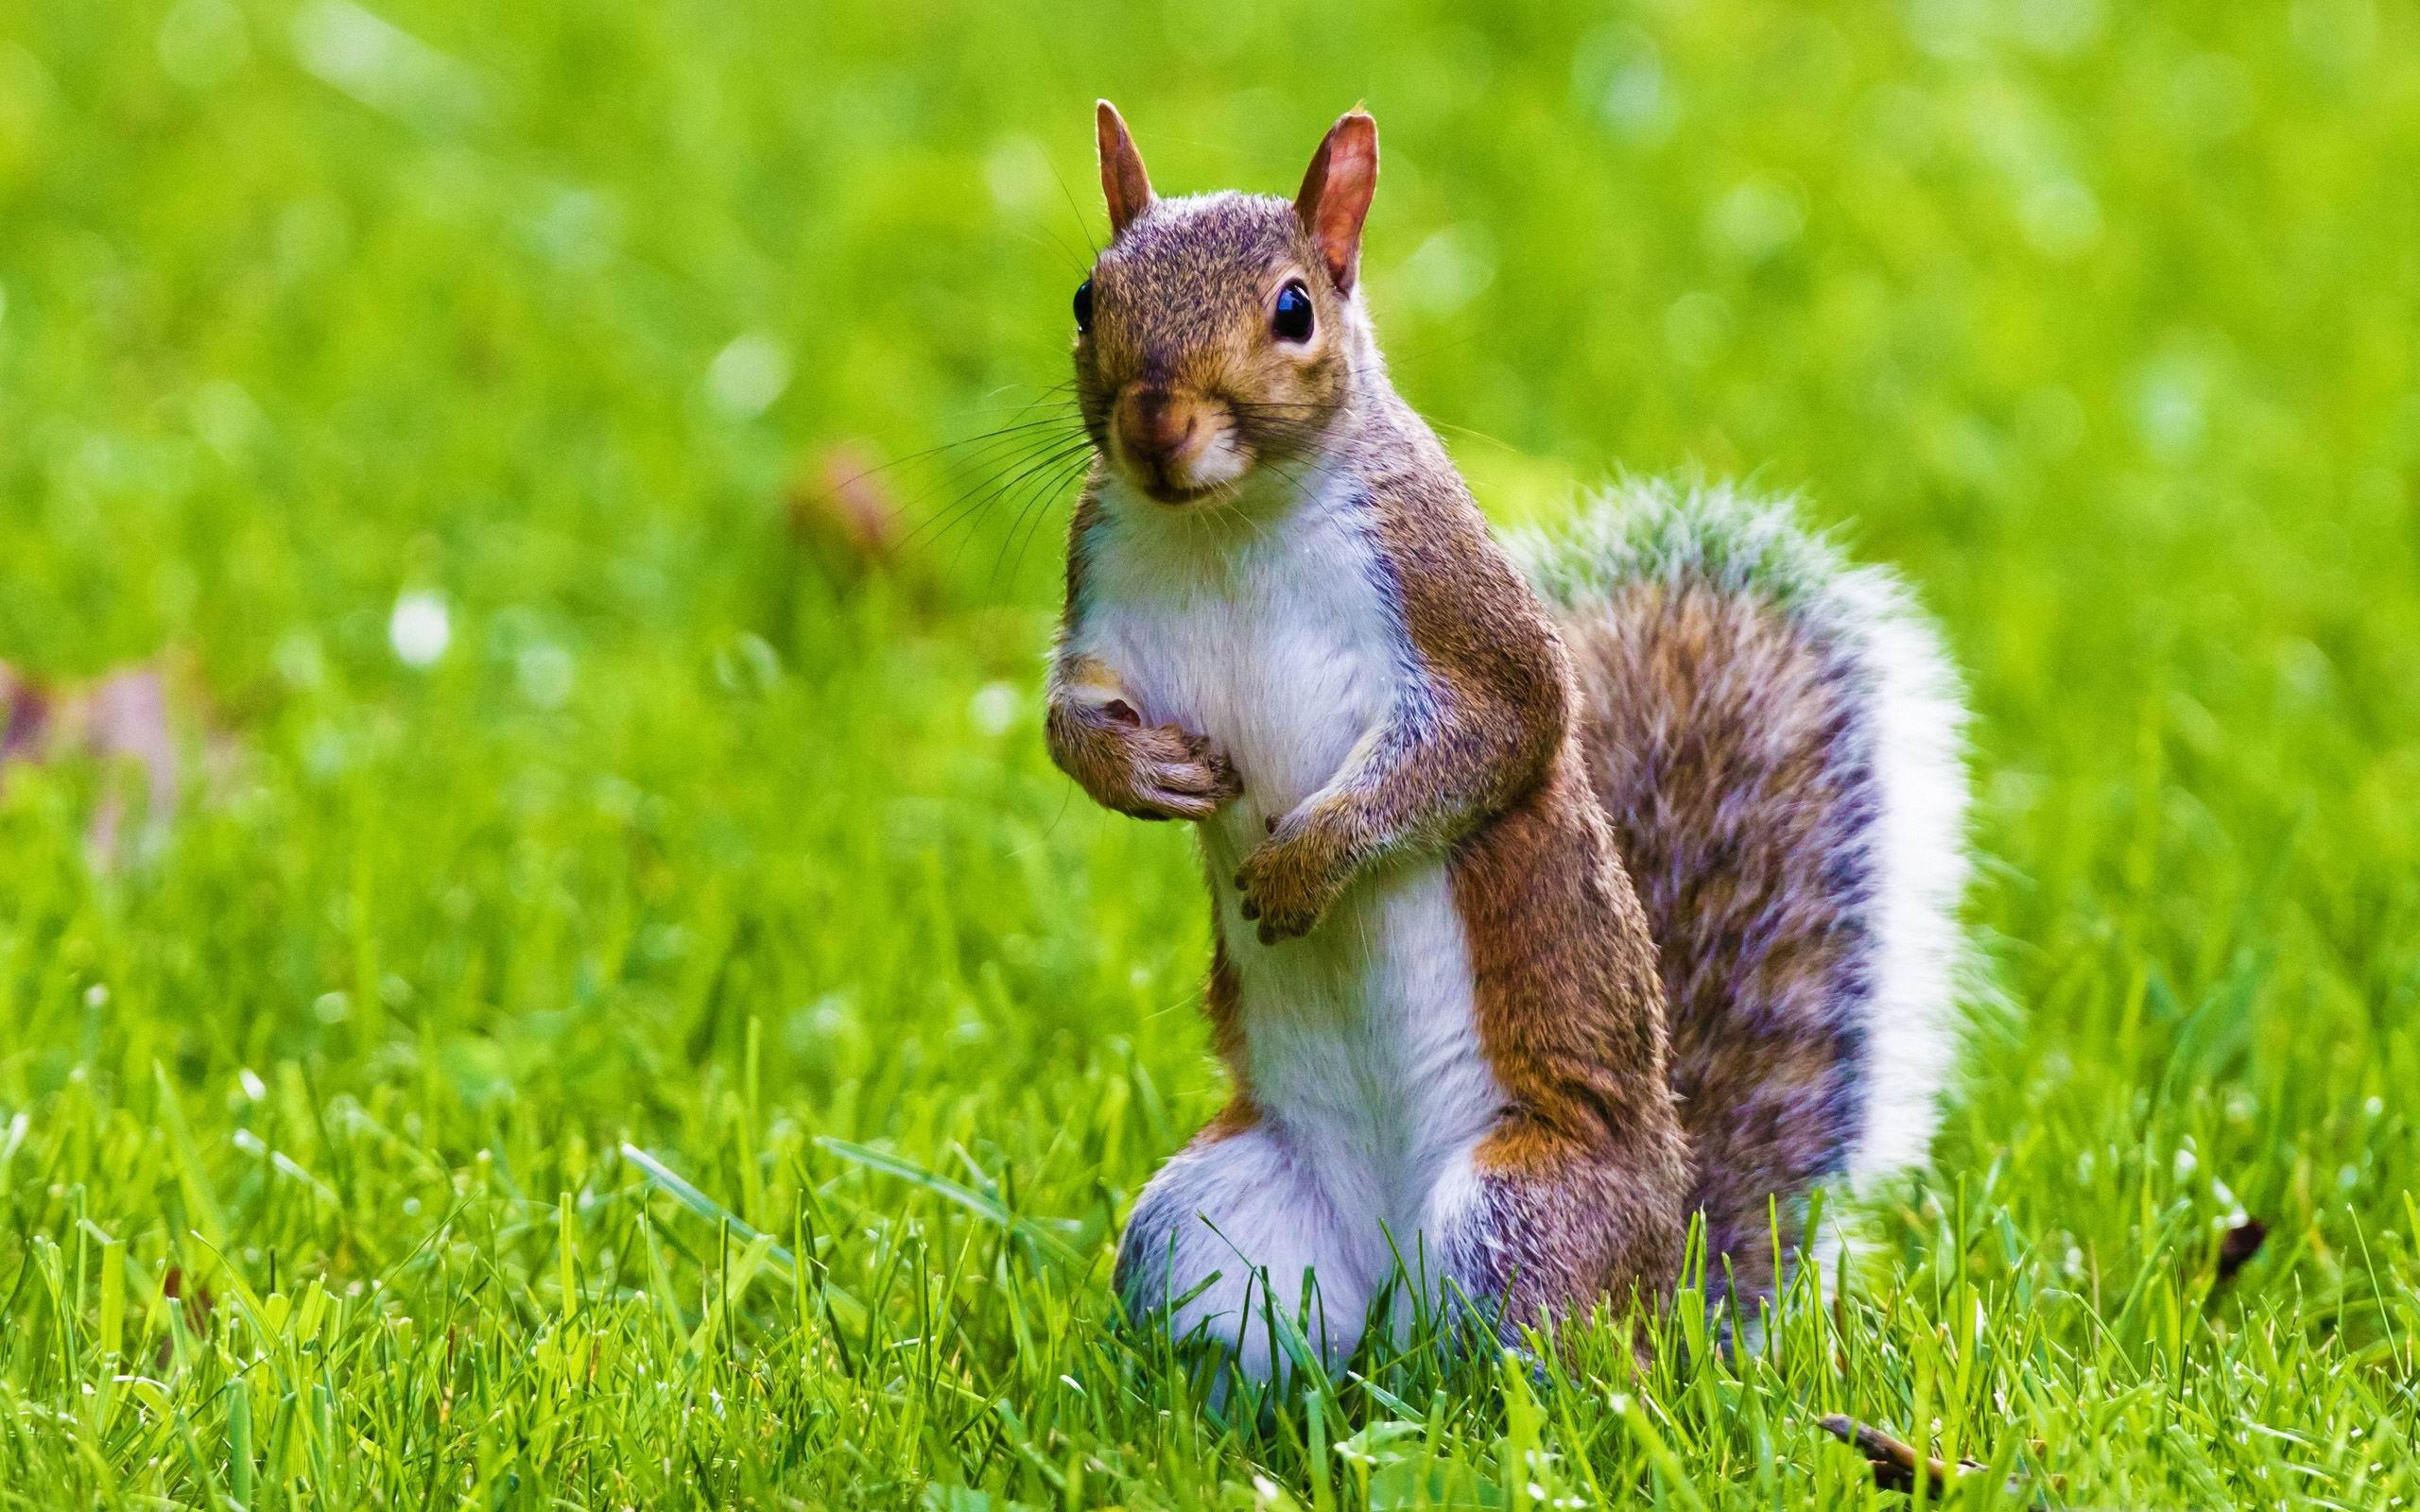 cute squirrel wild animal desktop wallpaper HD Wallpapers 2560x1600